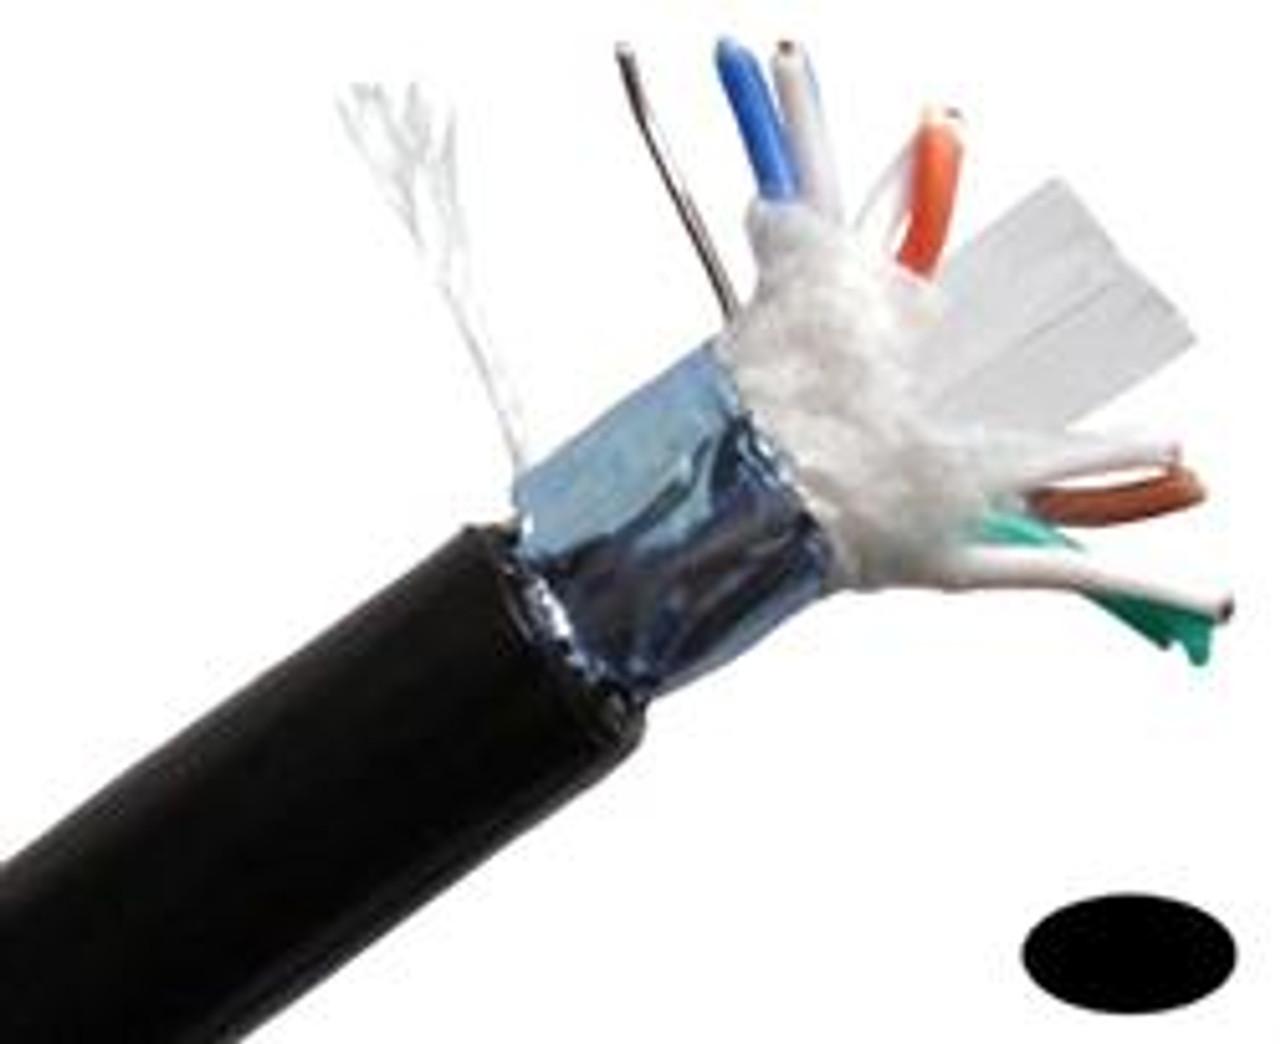 Cat 6 Vs Cat 7 Cable Wiring On Kabel Cat 5e Cat 6 Cat 7